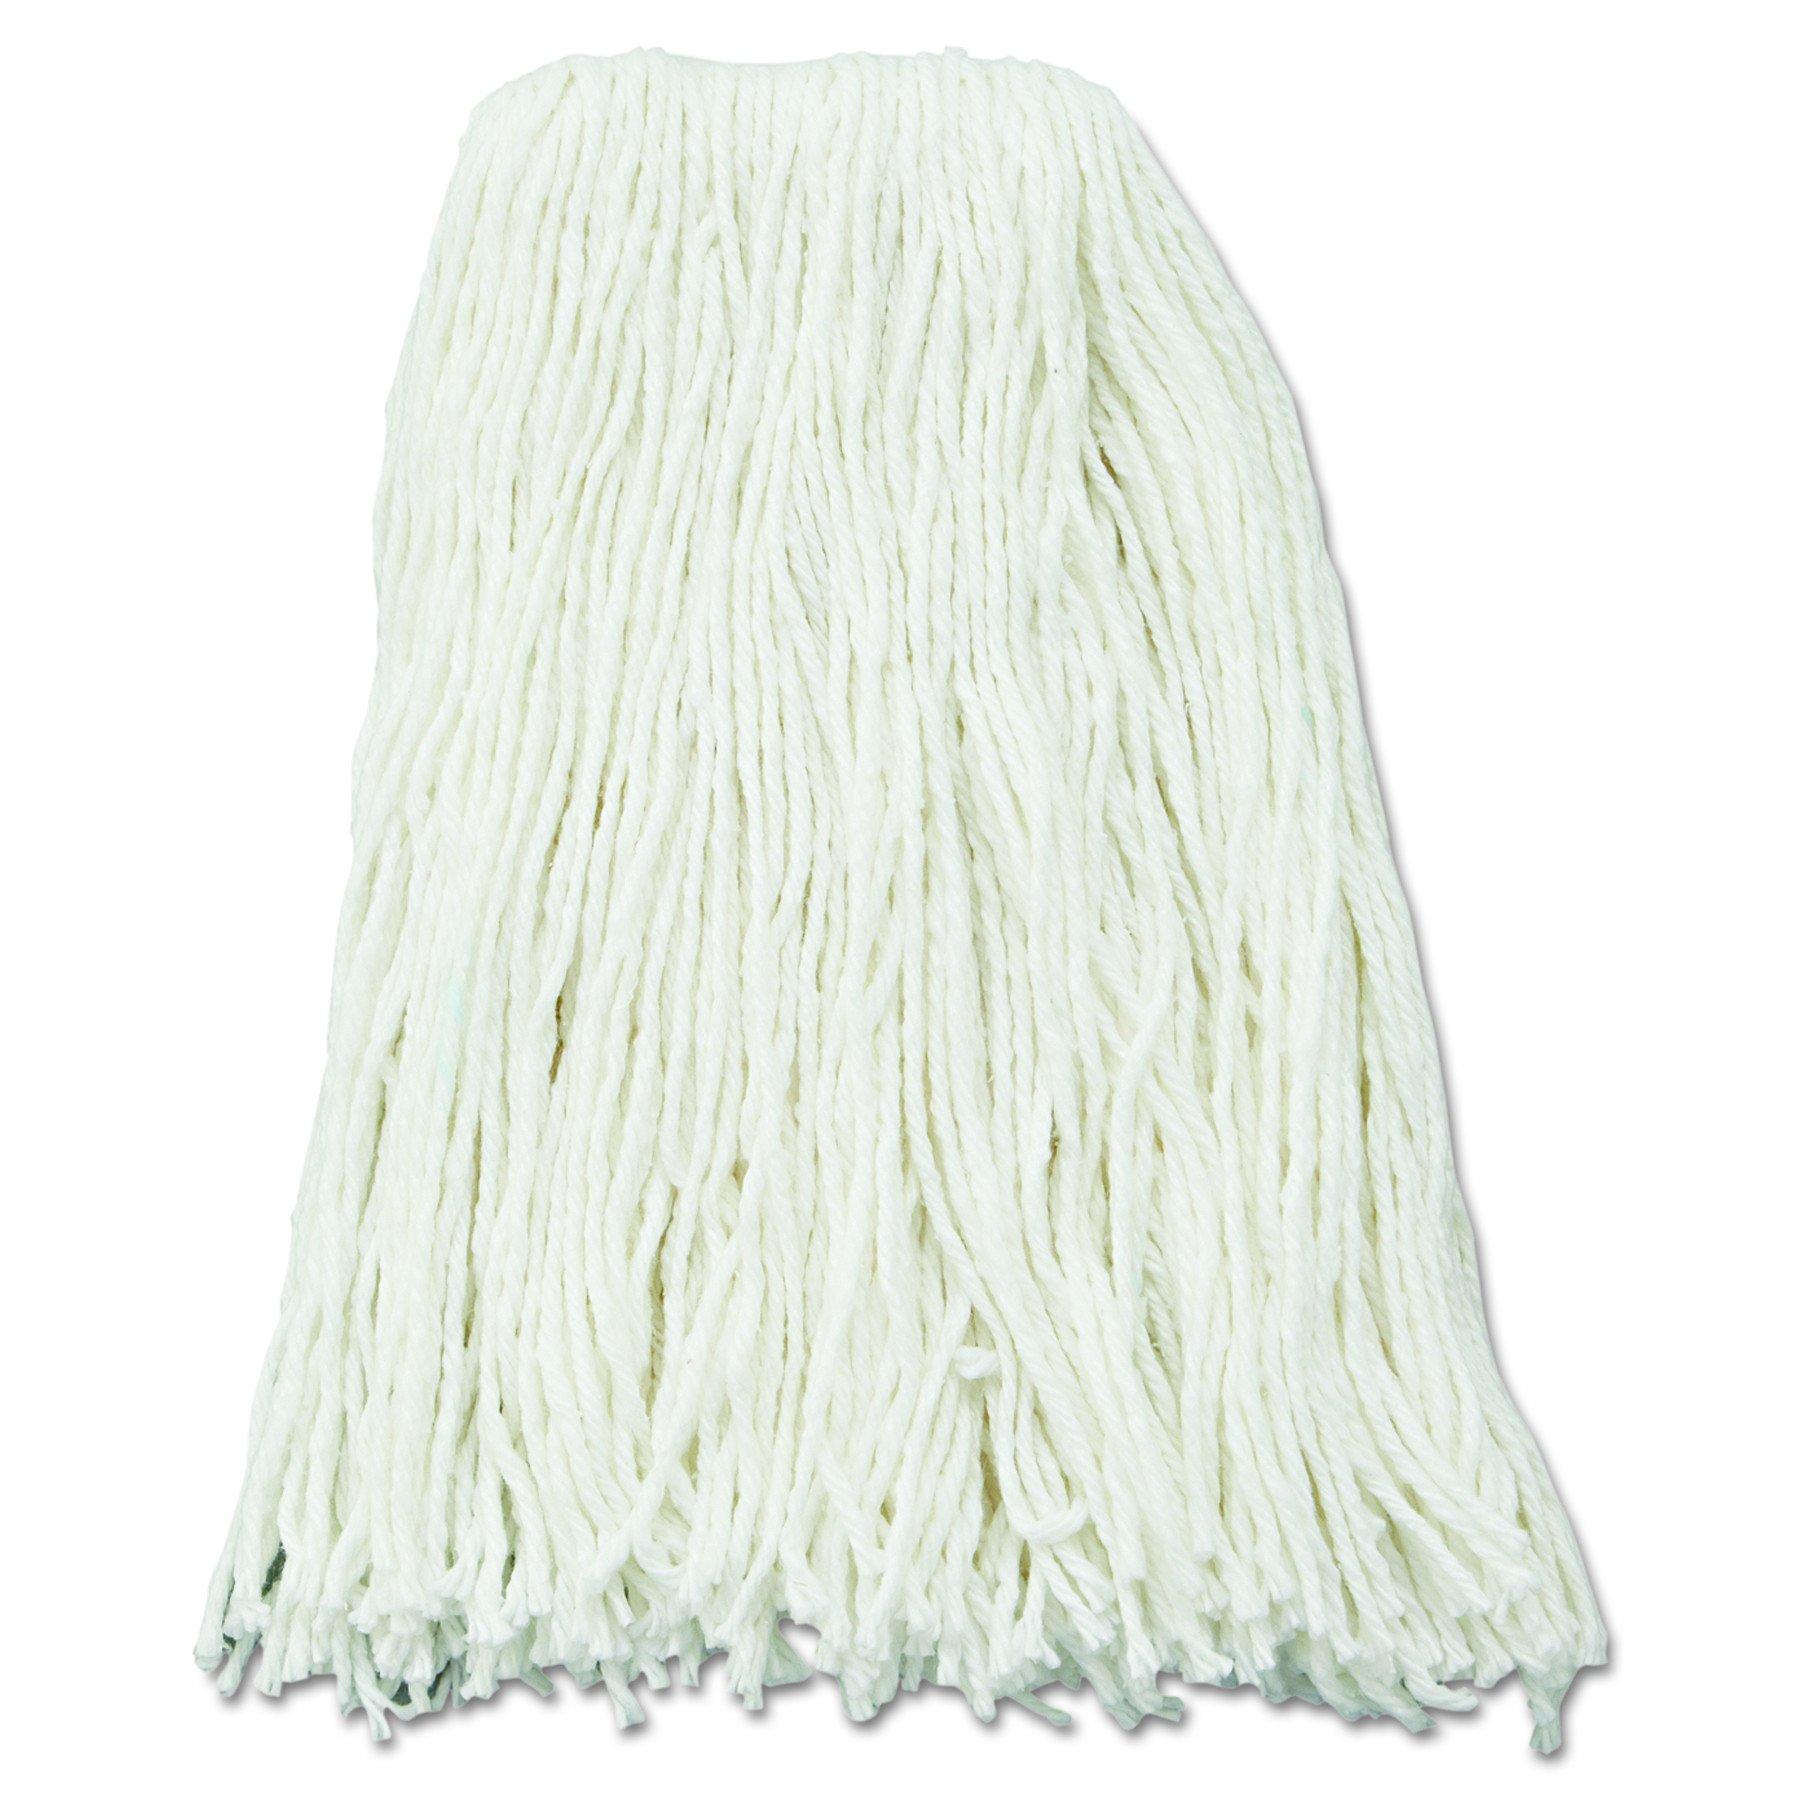 UNISAN Premium Cut-End Wet Mop Heads, Rayon, 16-Ounces, White, 12/Carton (216RCT)